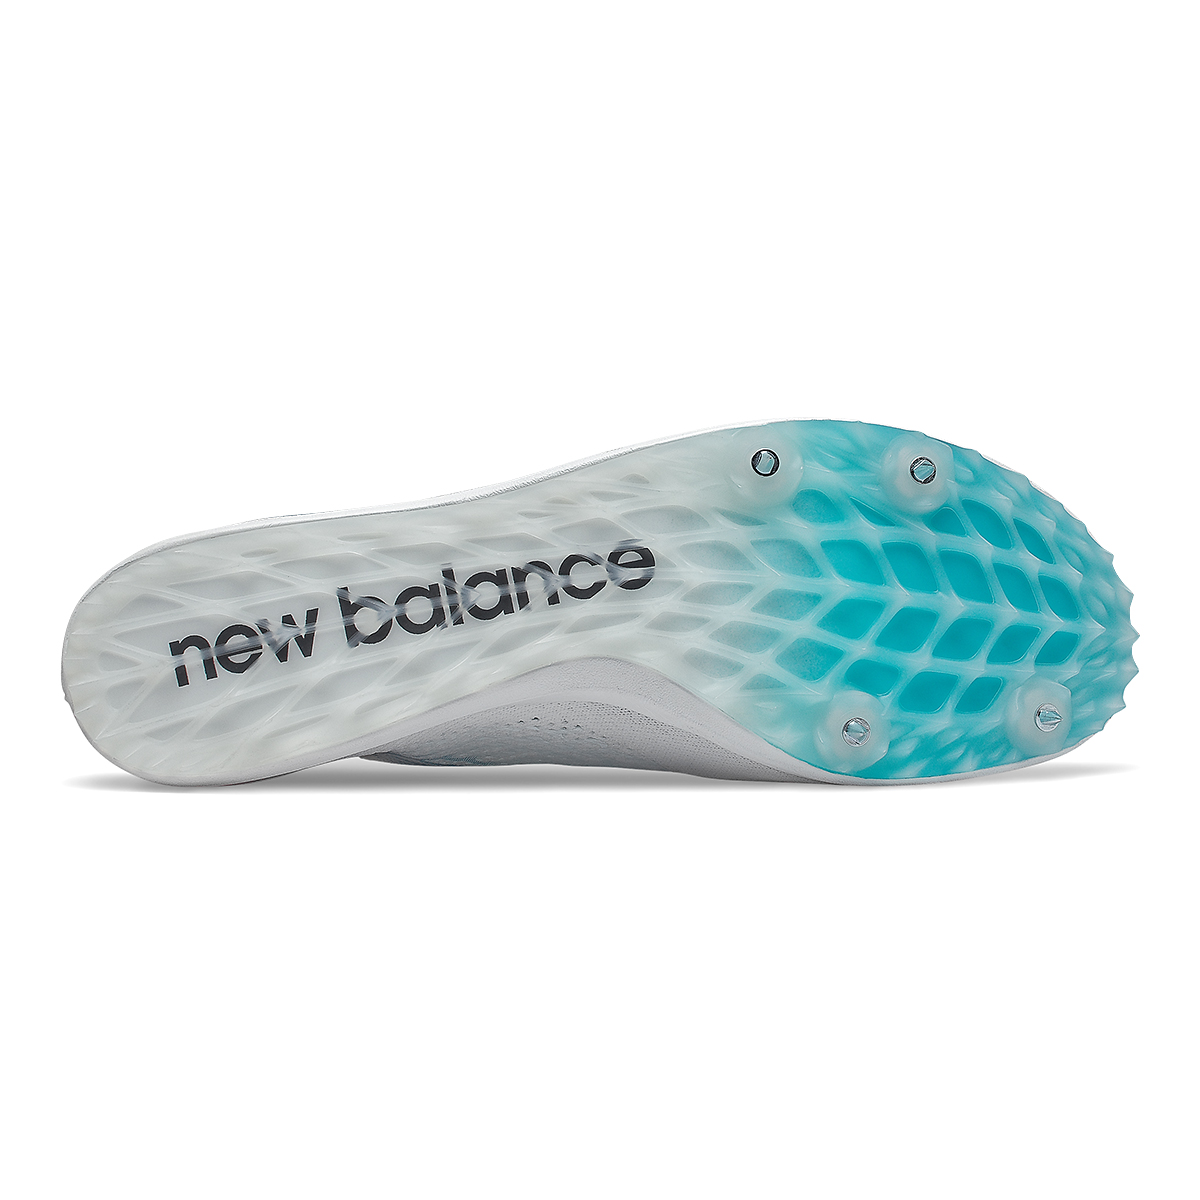 Men's New Balance LD5Kv8 Track Spikes - Color: White/Virtual Sky - Size: 8 - Width: Regular, White/Virtual Sky, large, image 3